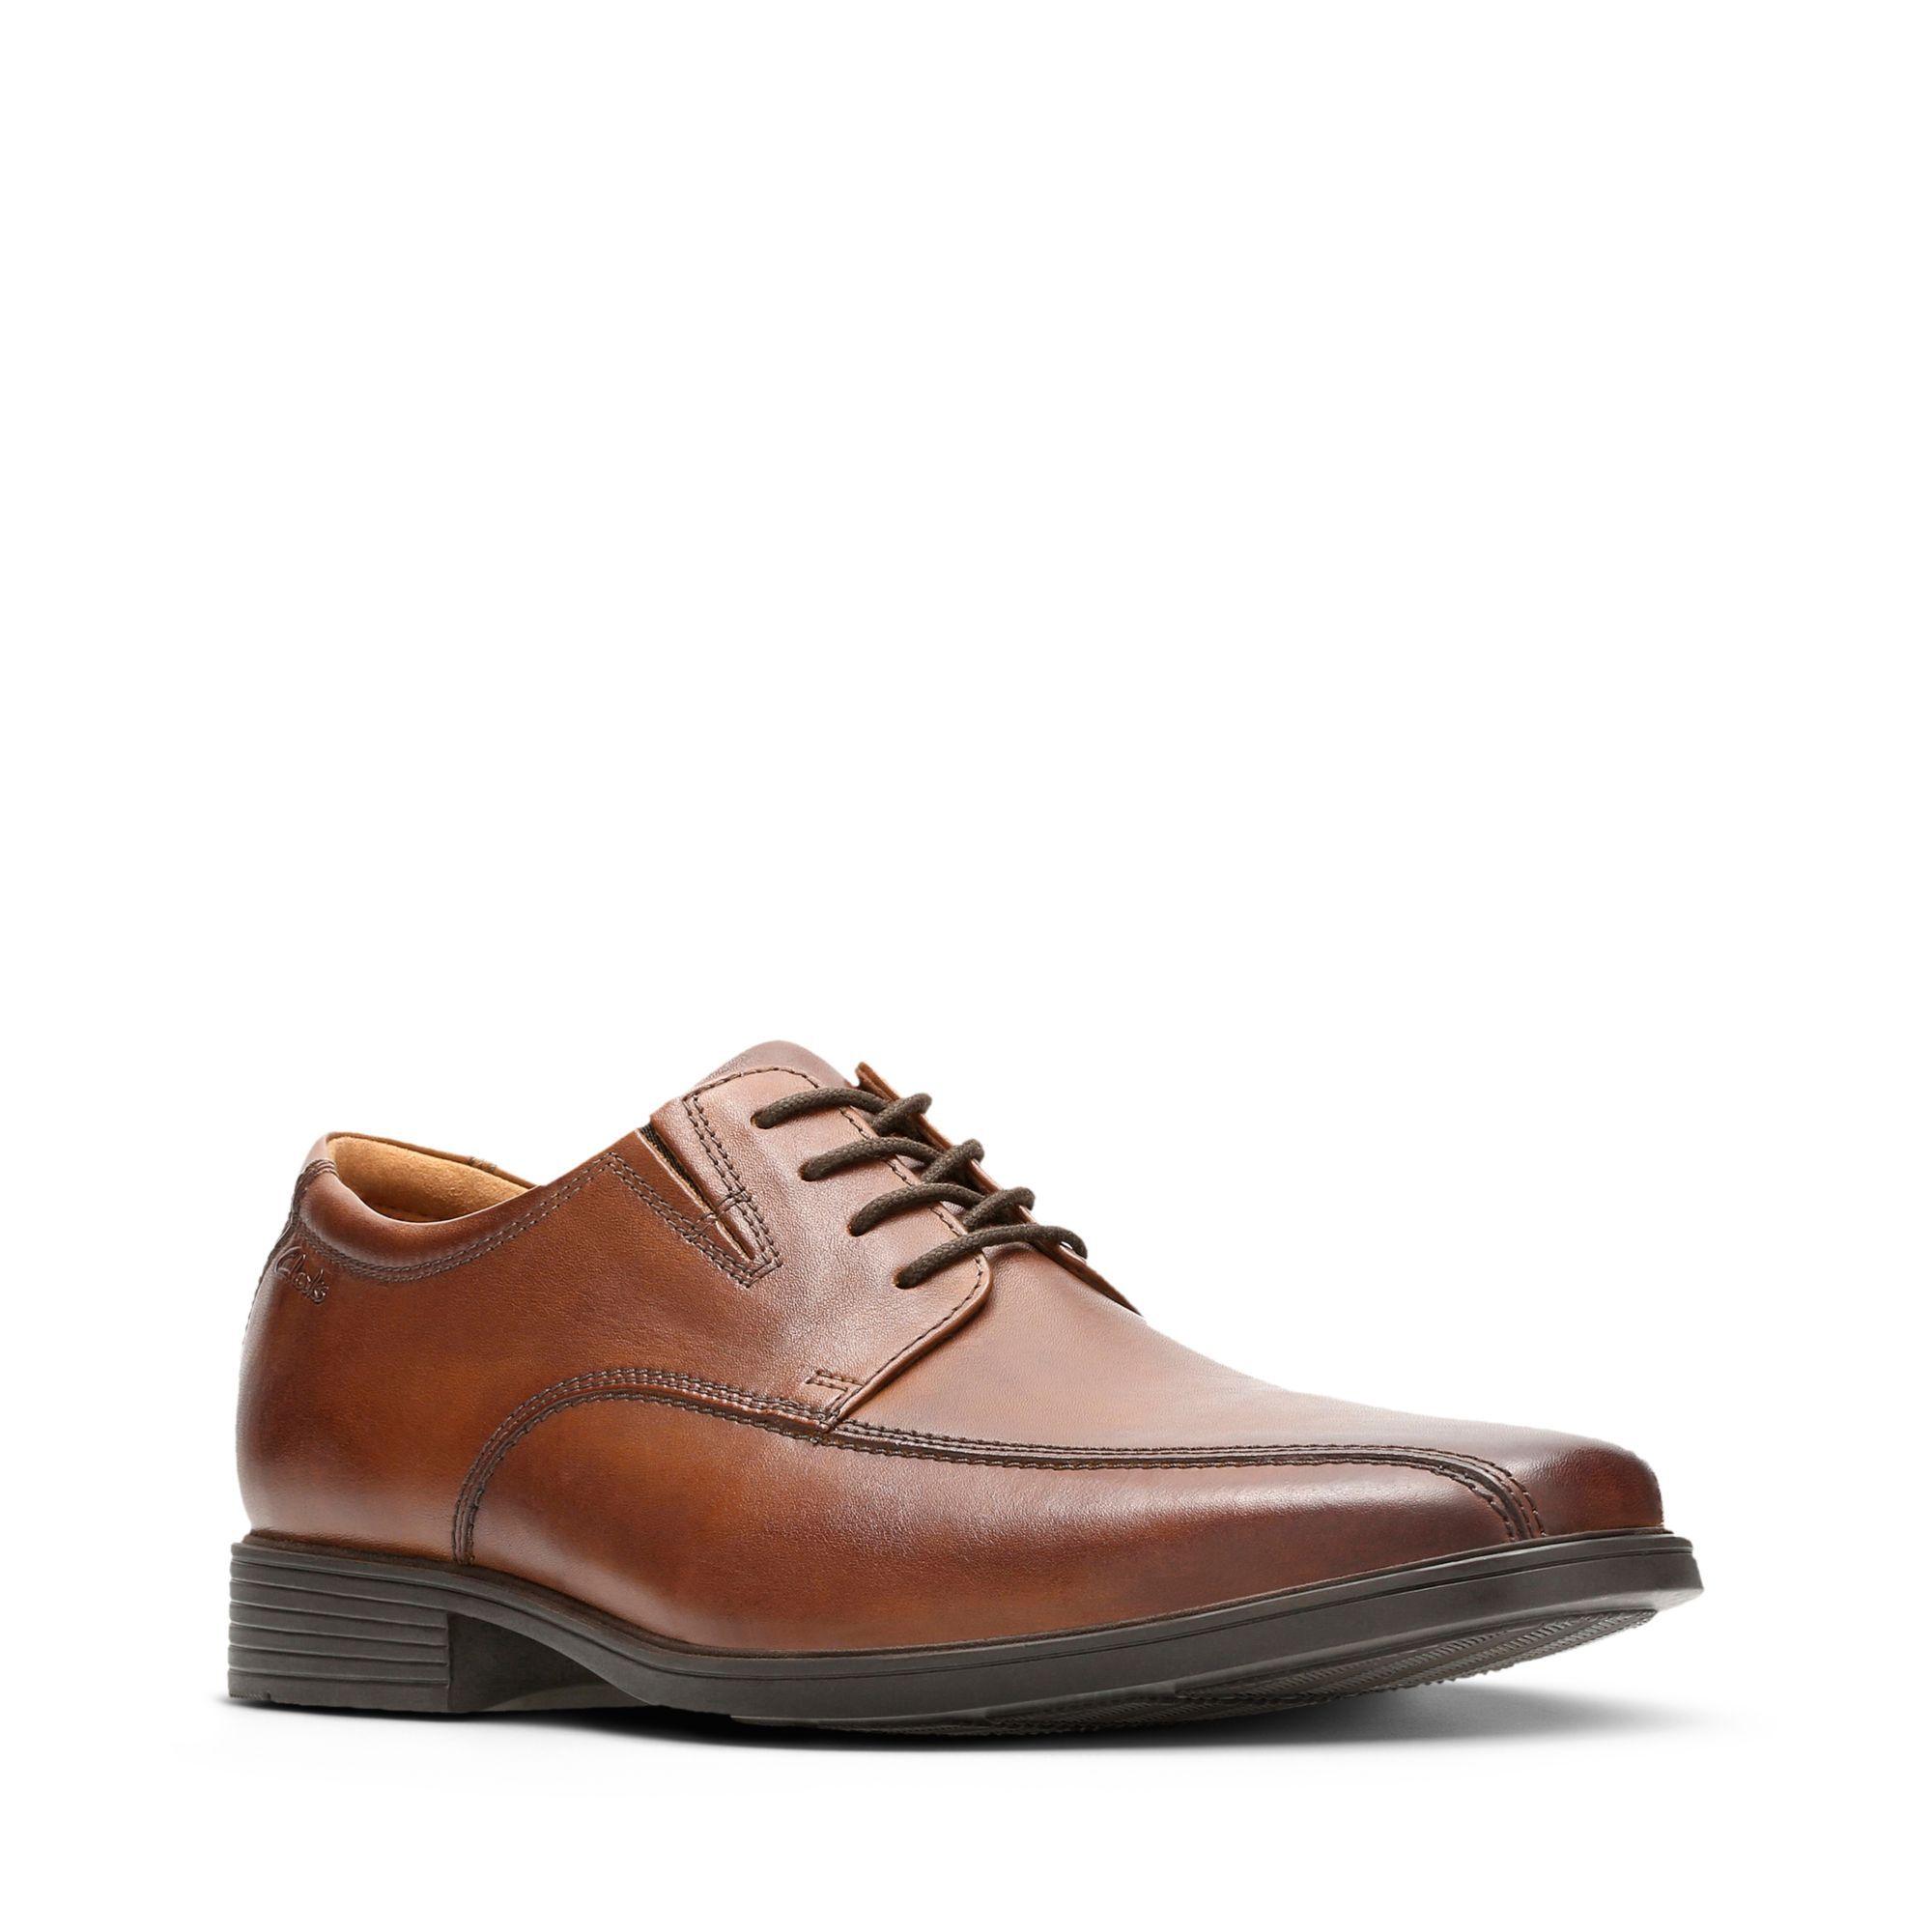 new Color Clarks Mens Tilden Walk Oxford Pick SZ//Color.